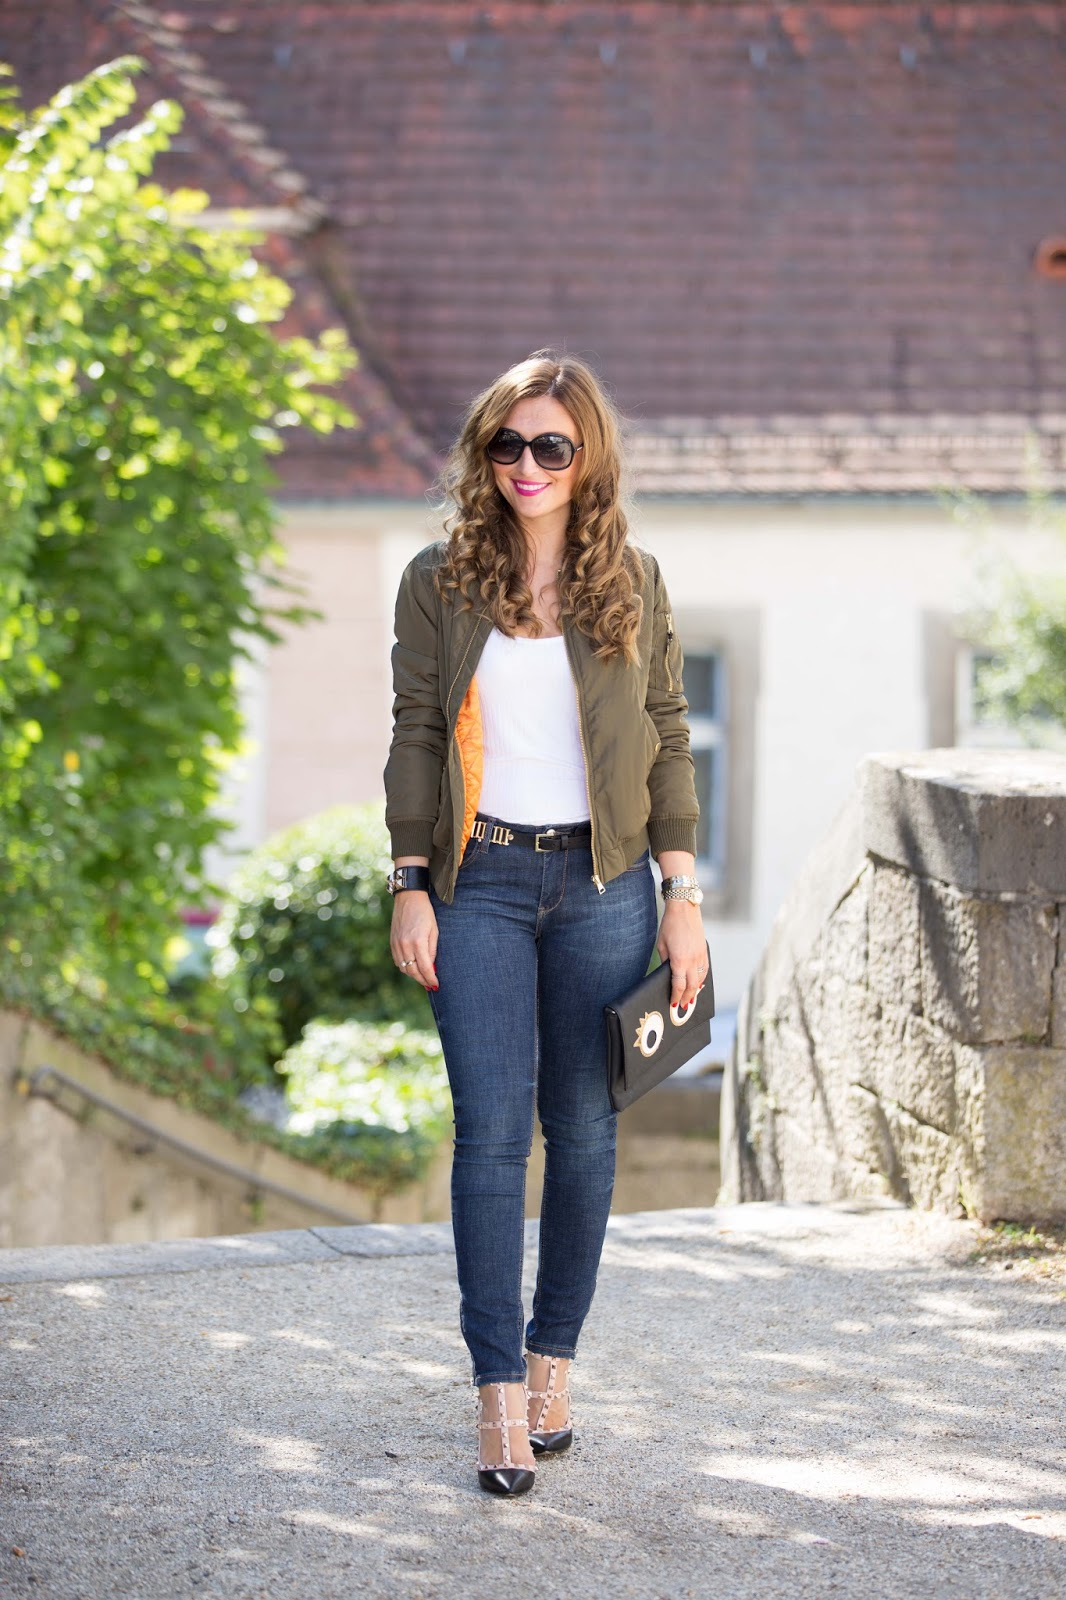 SheinsideFashionstylebyjohanna-fashionblog-frankfurt blogger-fashionblogger-bloggerdeutschland-lifestyleblog-modeblog-frankfurt-germanblogger-styleblog-bundfaltenhose-a-la-streetwear-chic-Khaki Bomberjacke